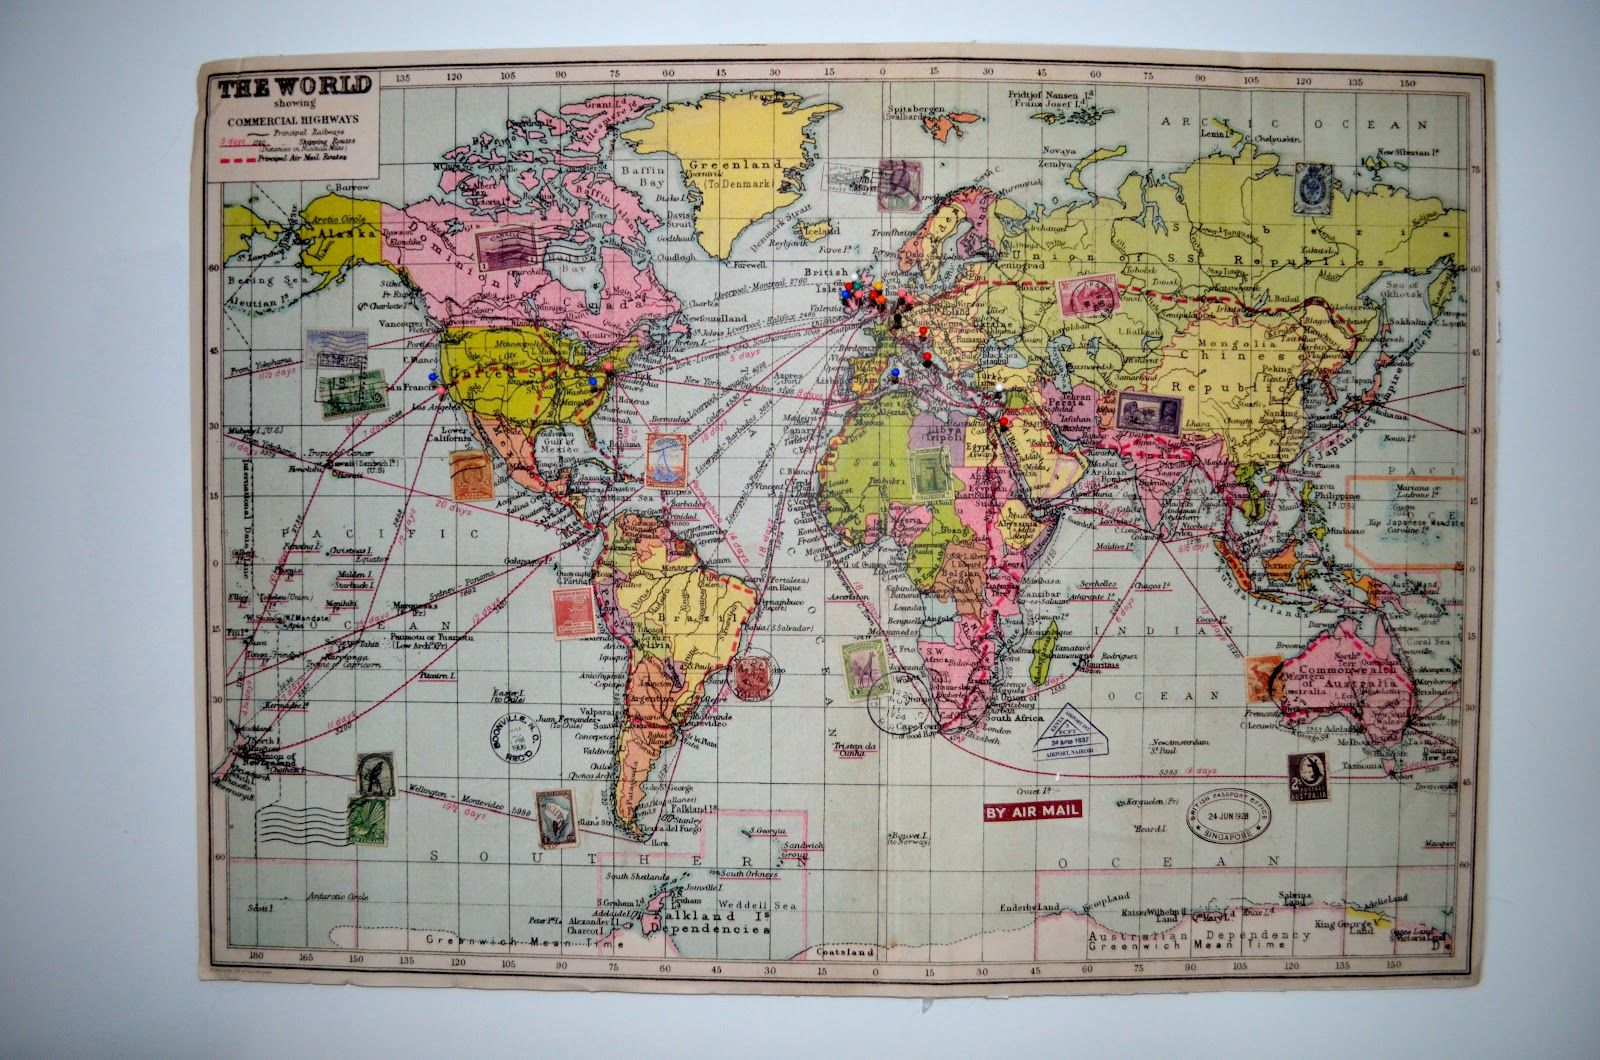 Diy world map pinboard mapsnroll pinterest pin boards diy world map pinboard sciox Choice Image